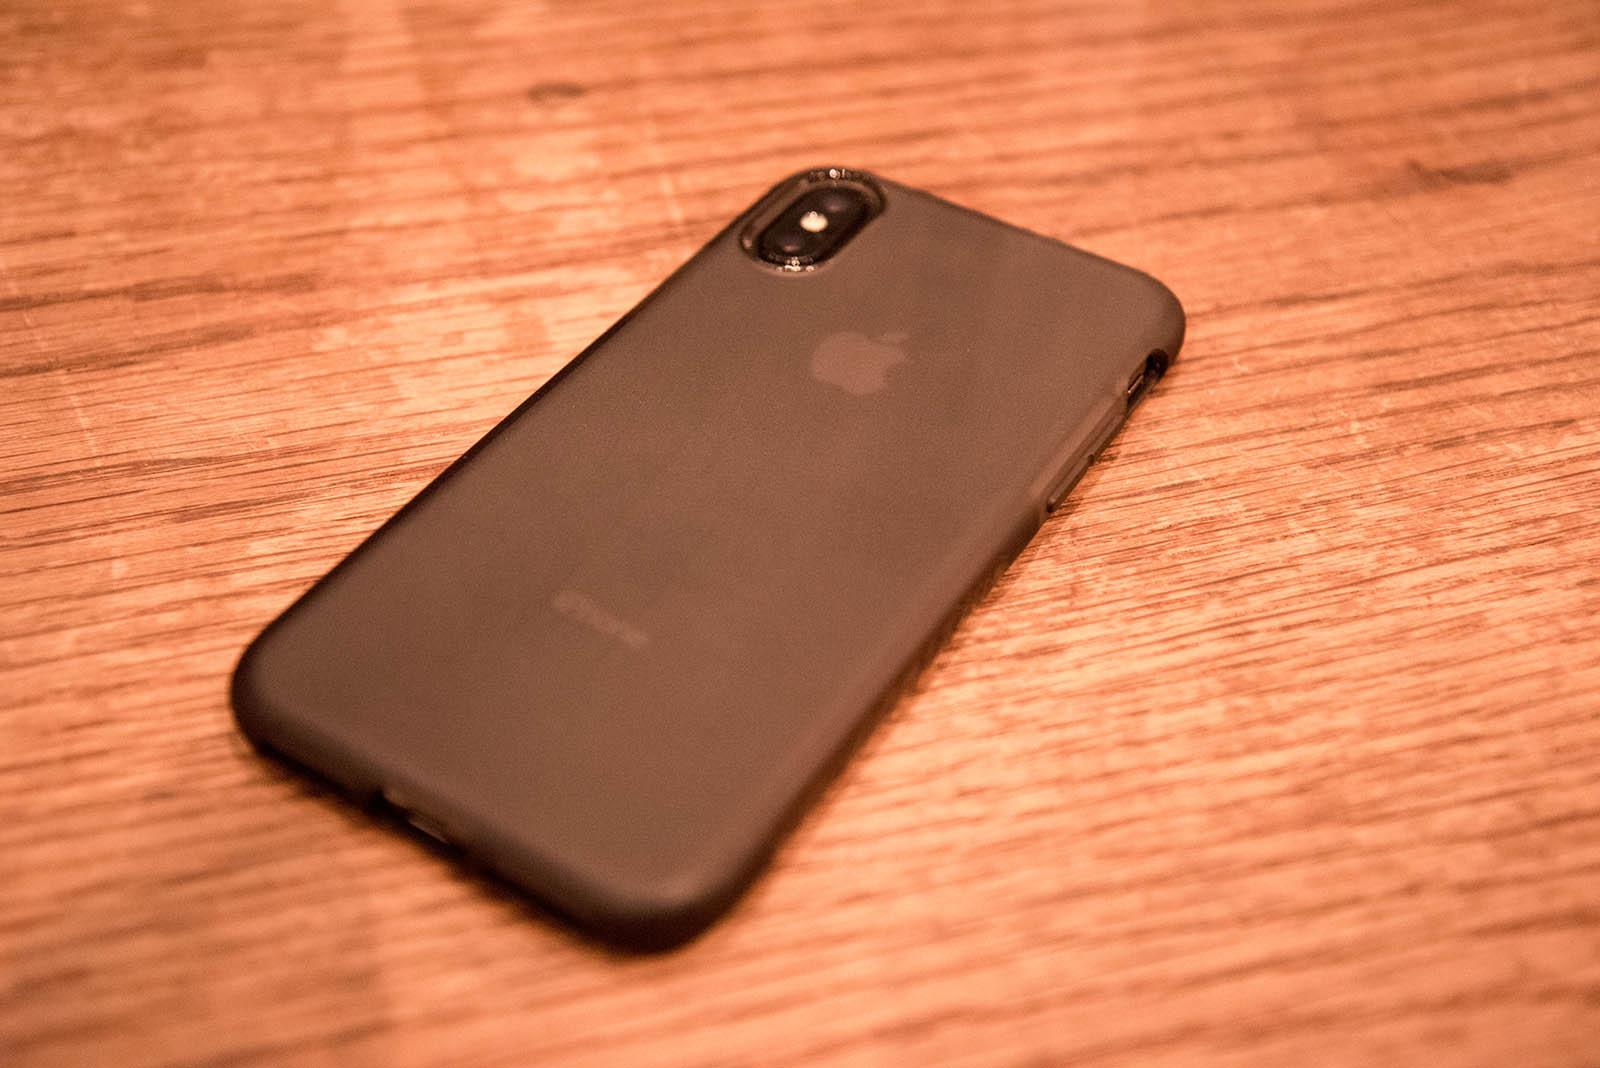 AnkerのKARAPAXケースを装着したiPhone X